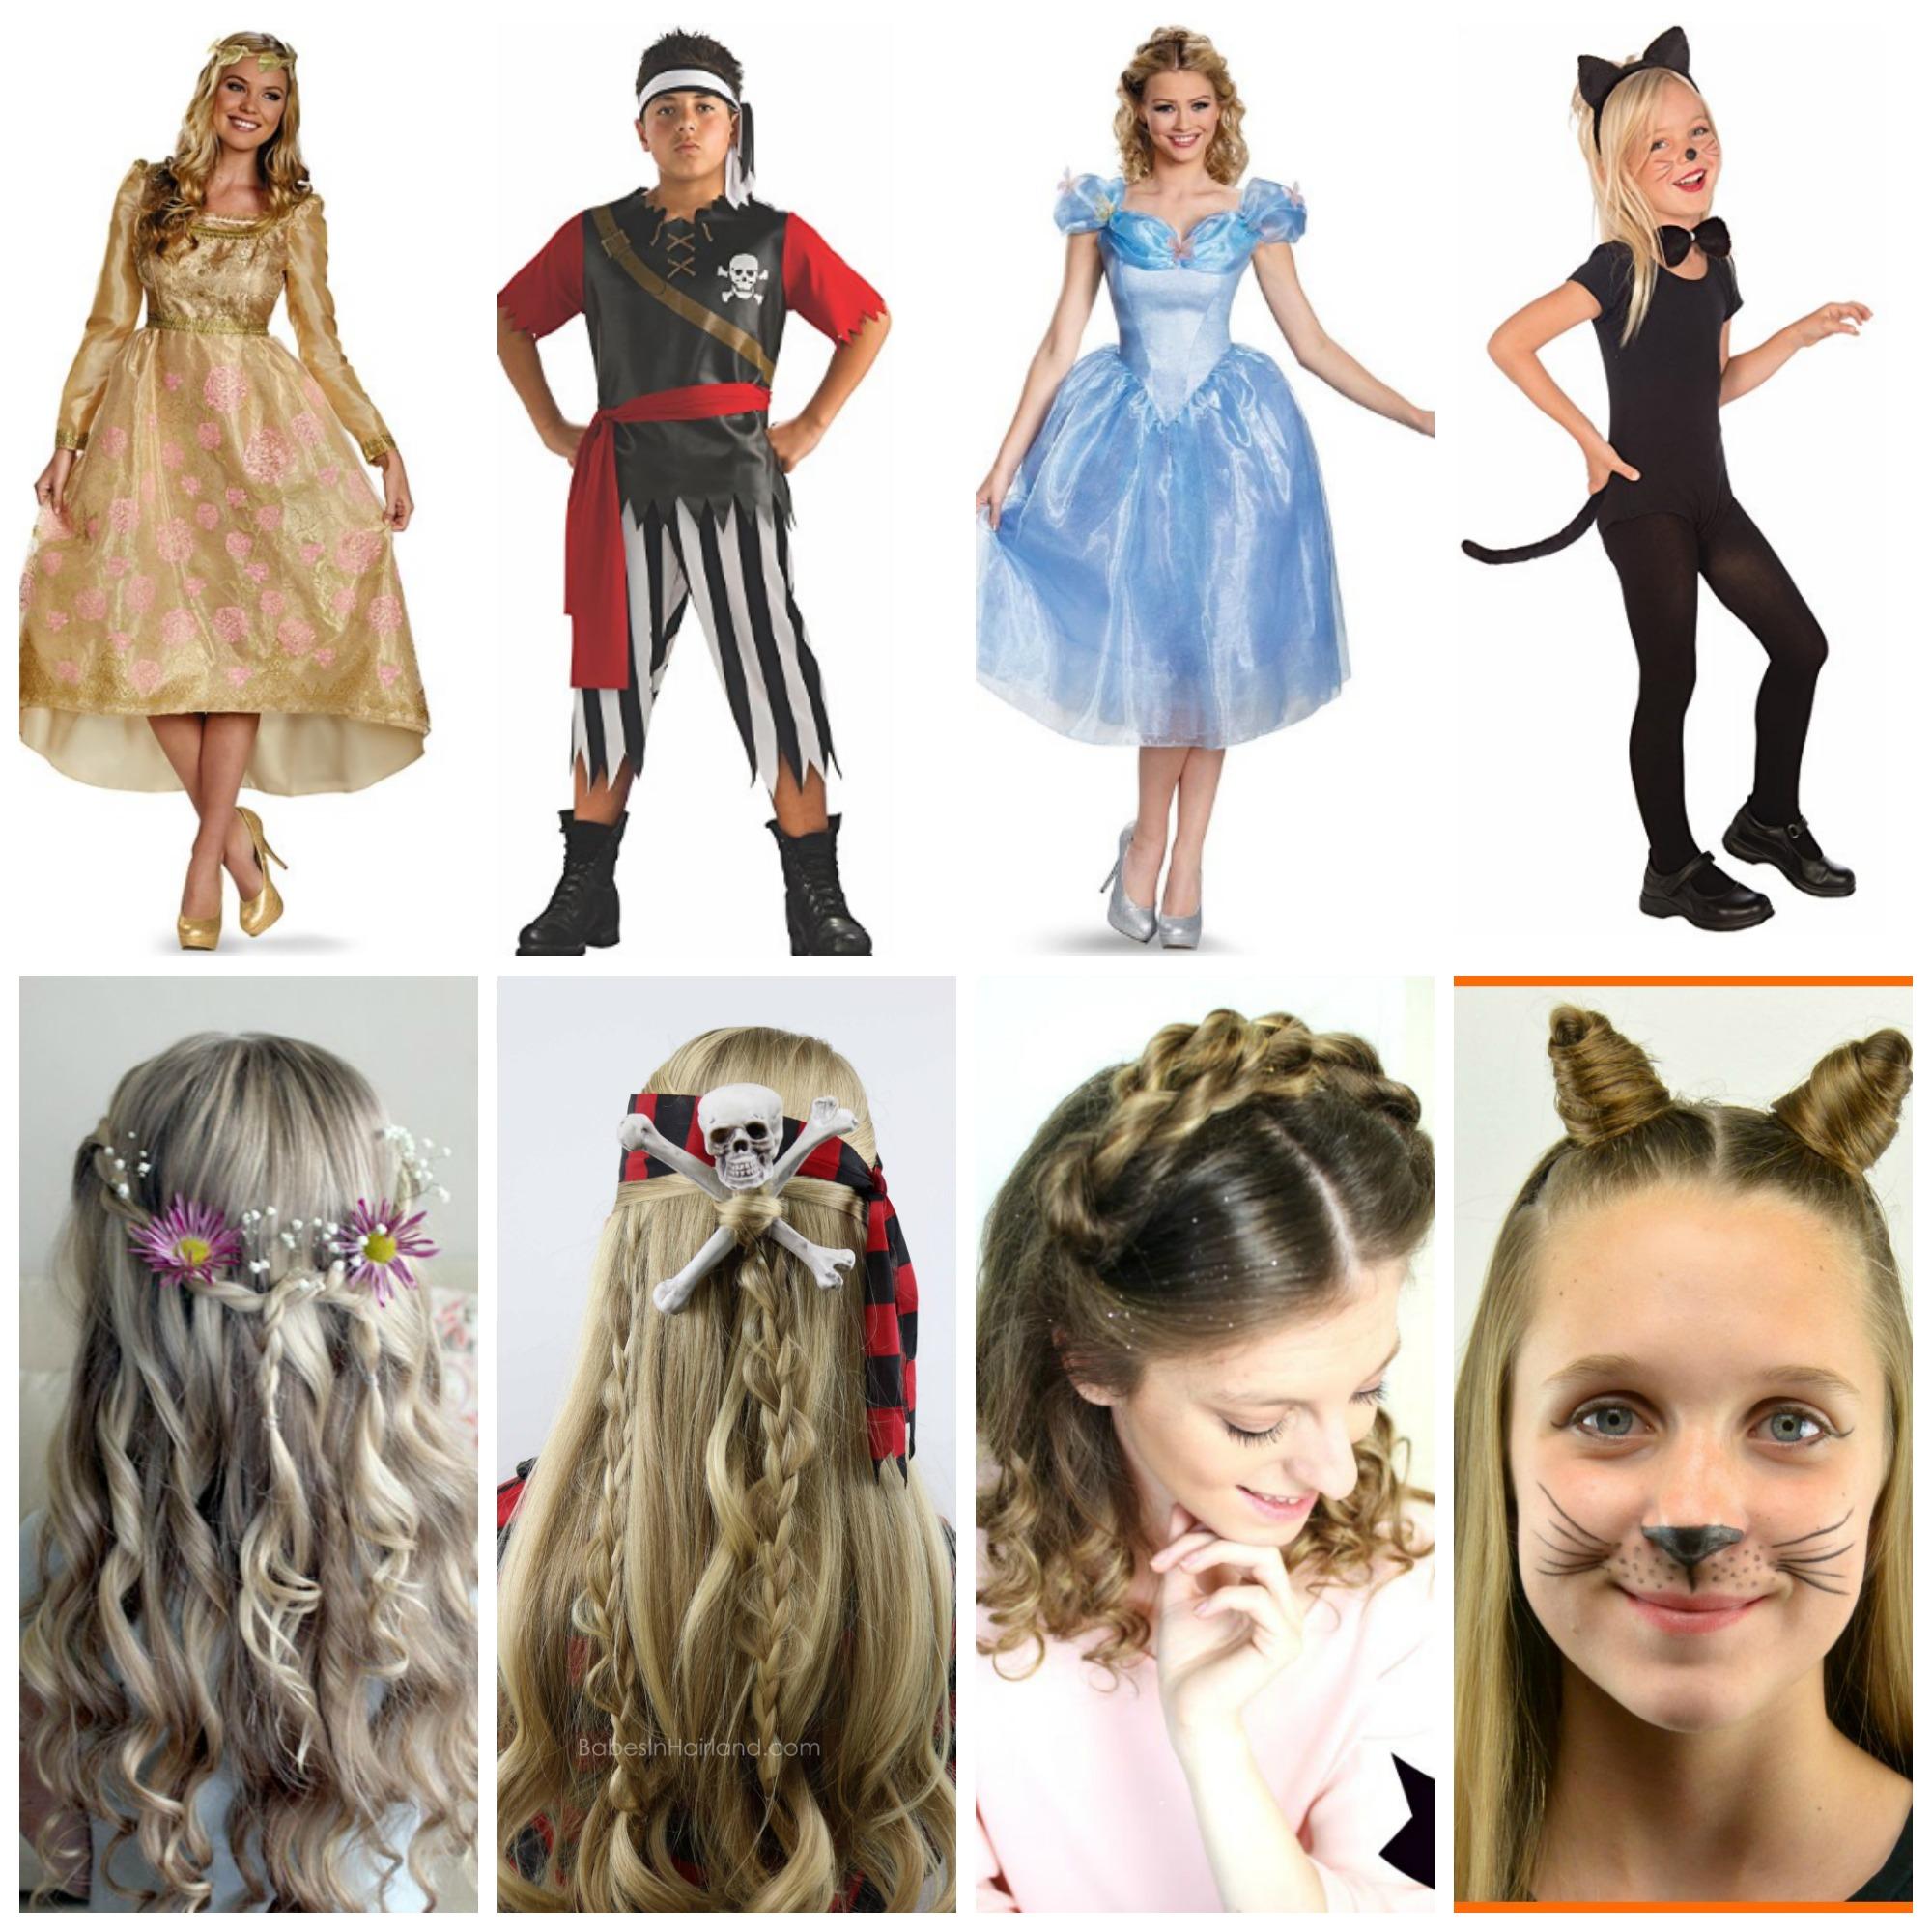 prvw-halloween-costumes-hair3